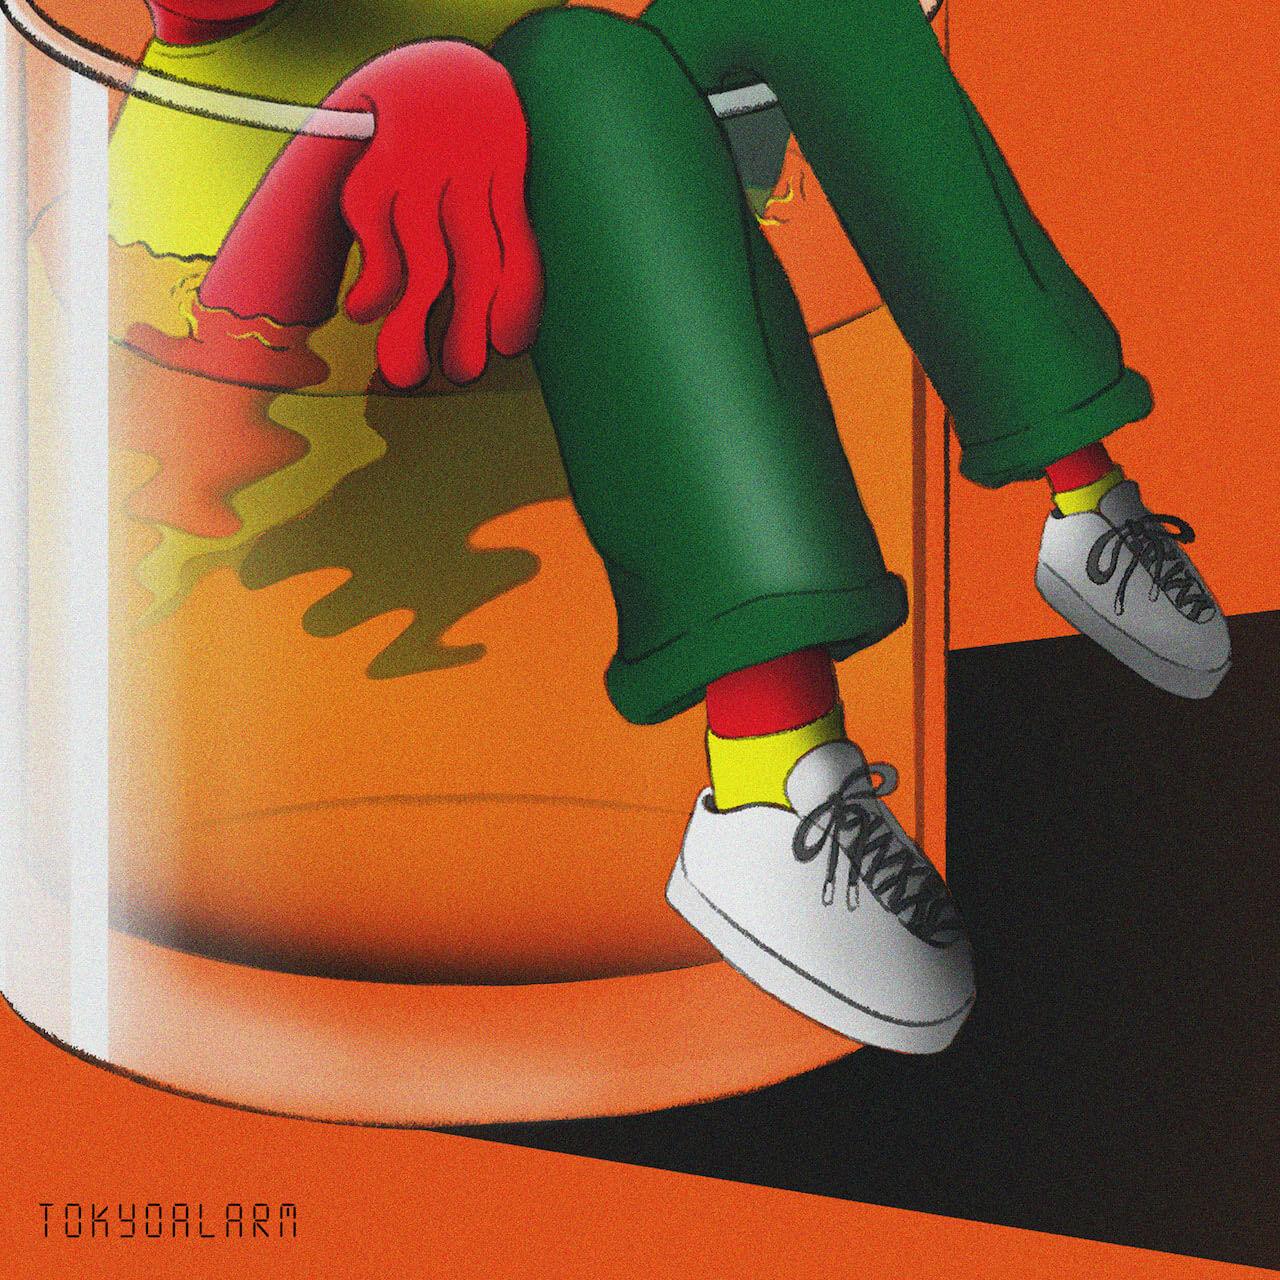 "〈ROOFTOP〉所属のShun Maruno、原島""ど真ん中""宙芳&GAPPERを客演に迎えた新曲「TOKYO ALARM」をリリース music200925-shunmaruno-1"